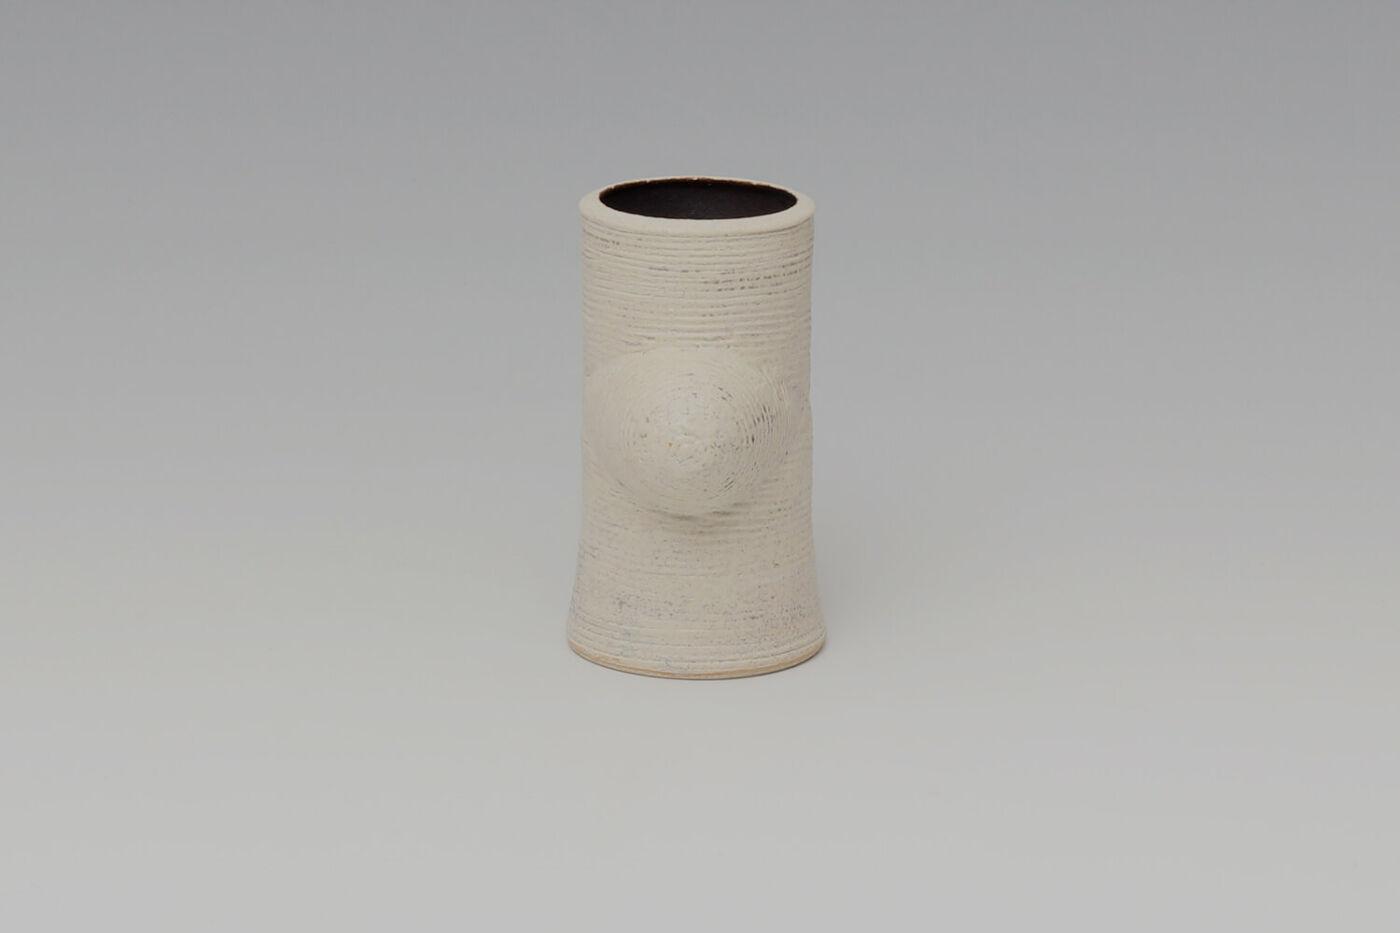 Chris Carter Ceramic Grooved Crossed Form 156